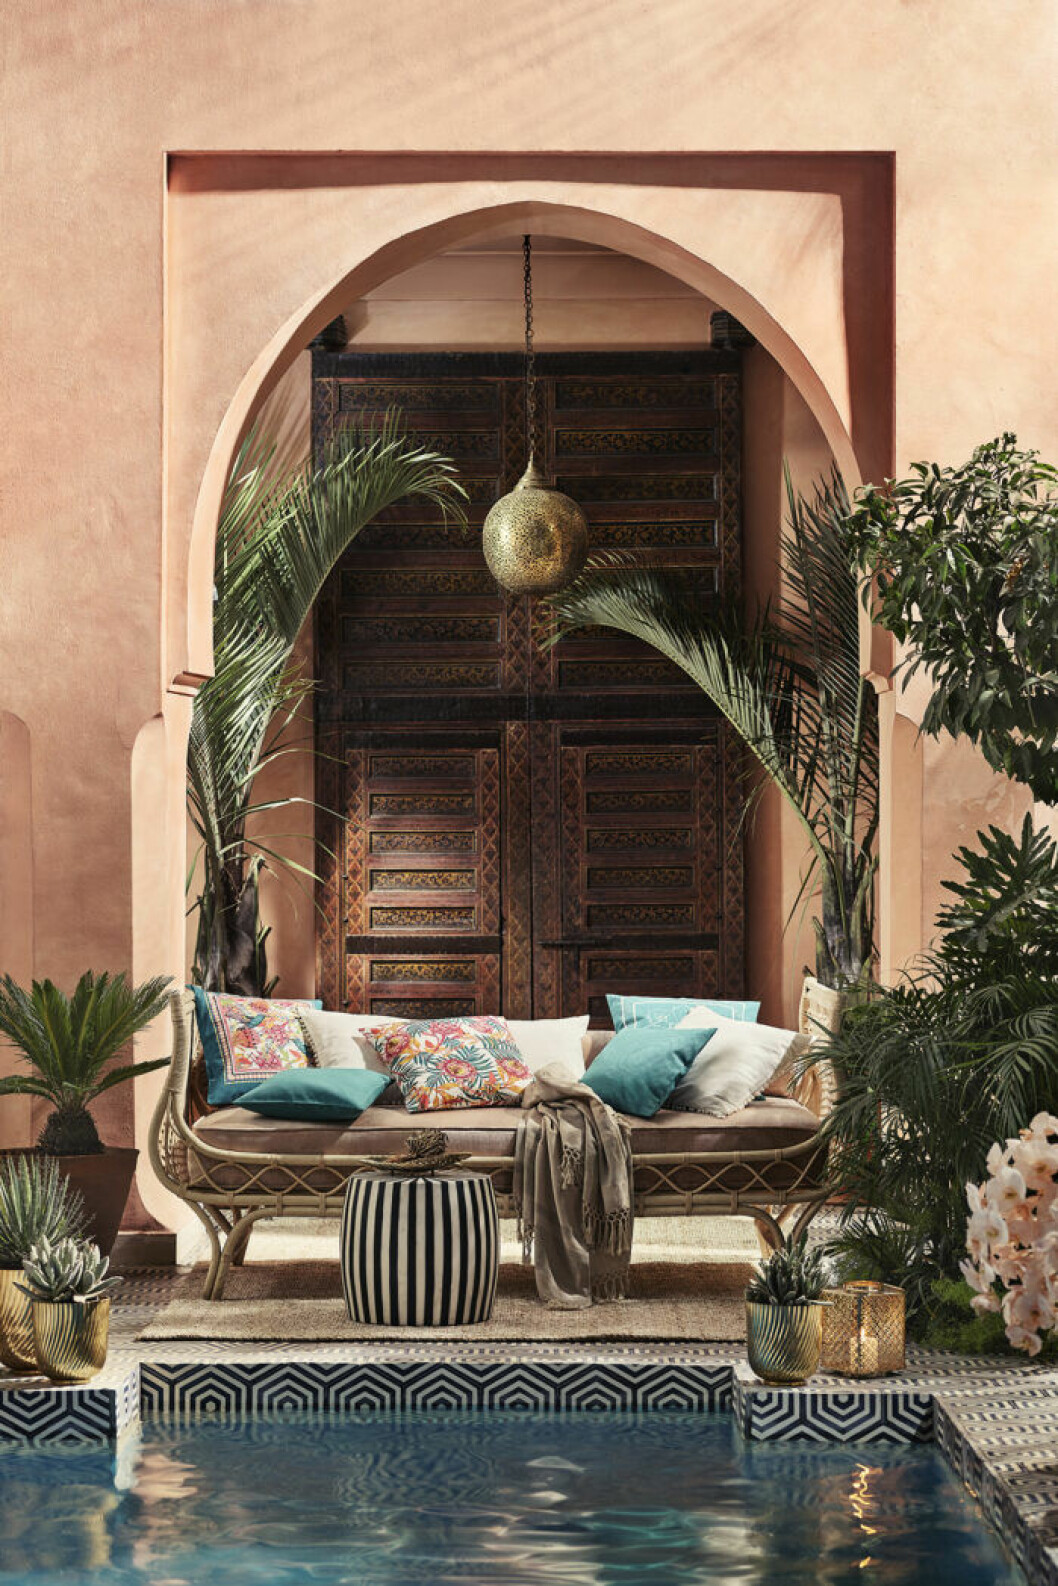 H&M home inspireras av Marrakech